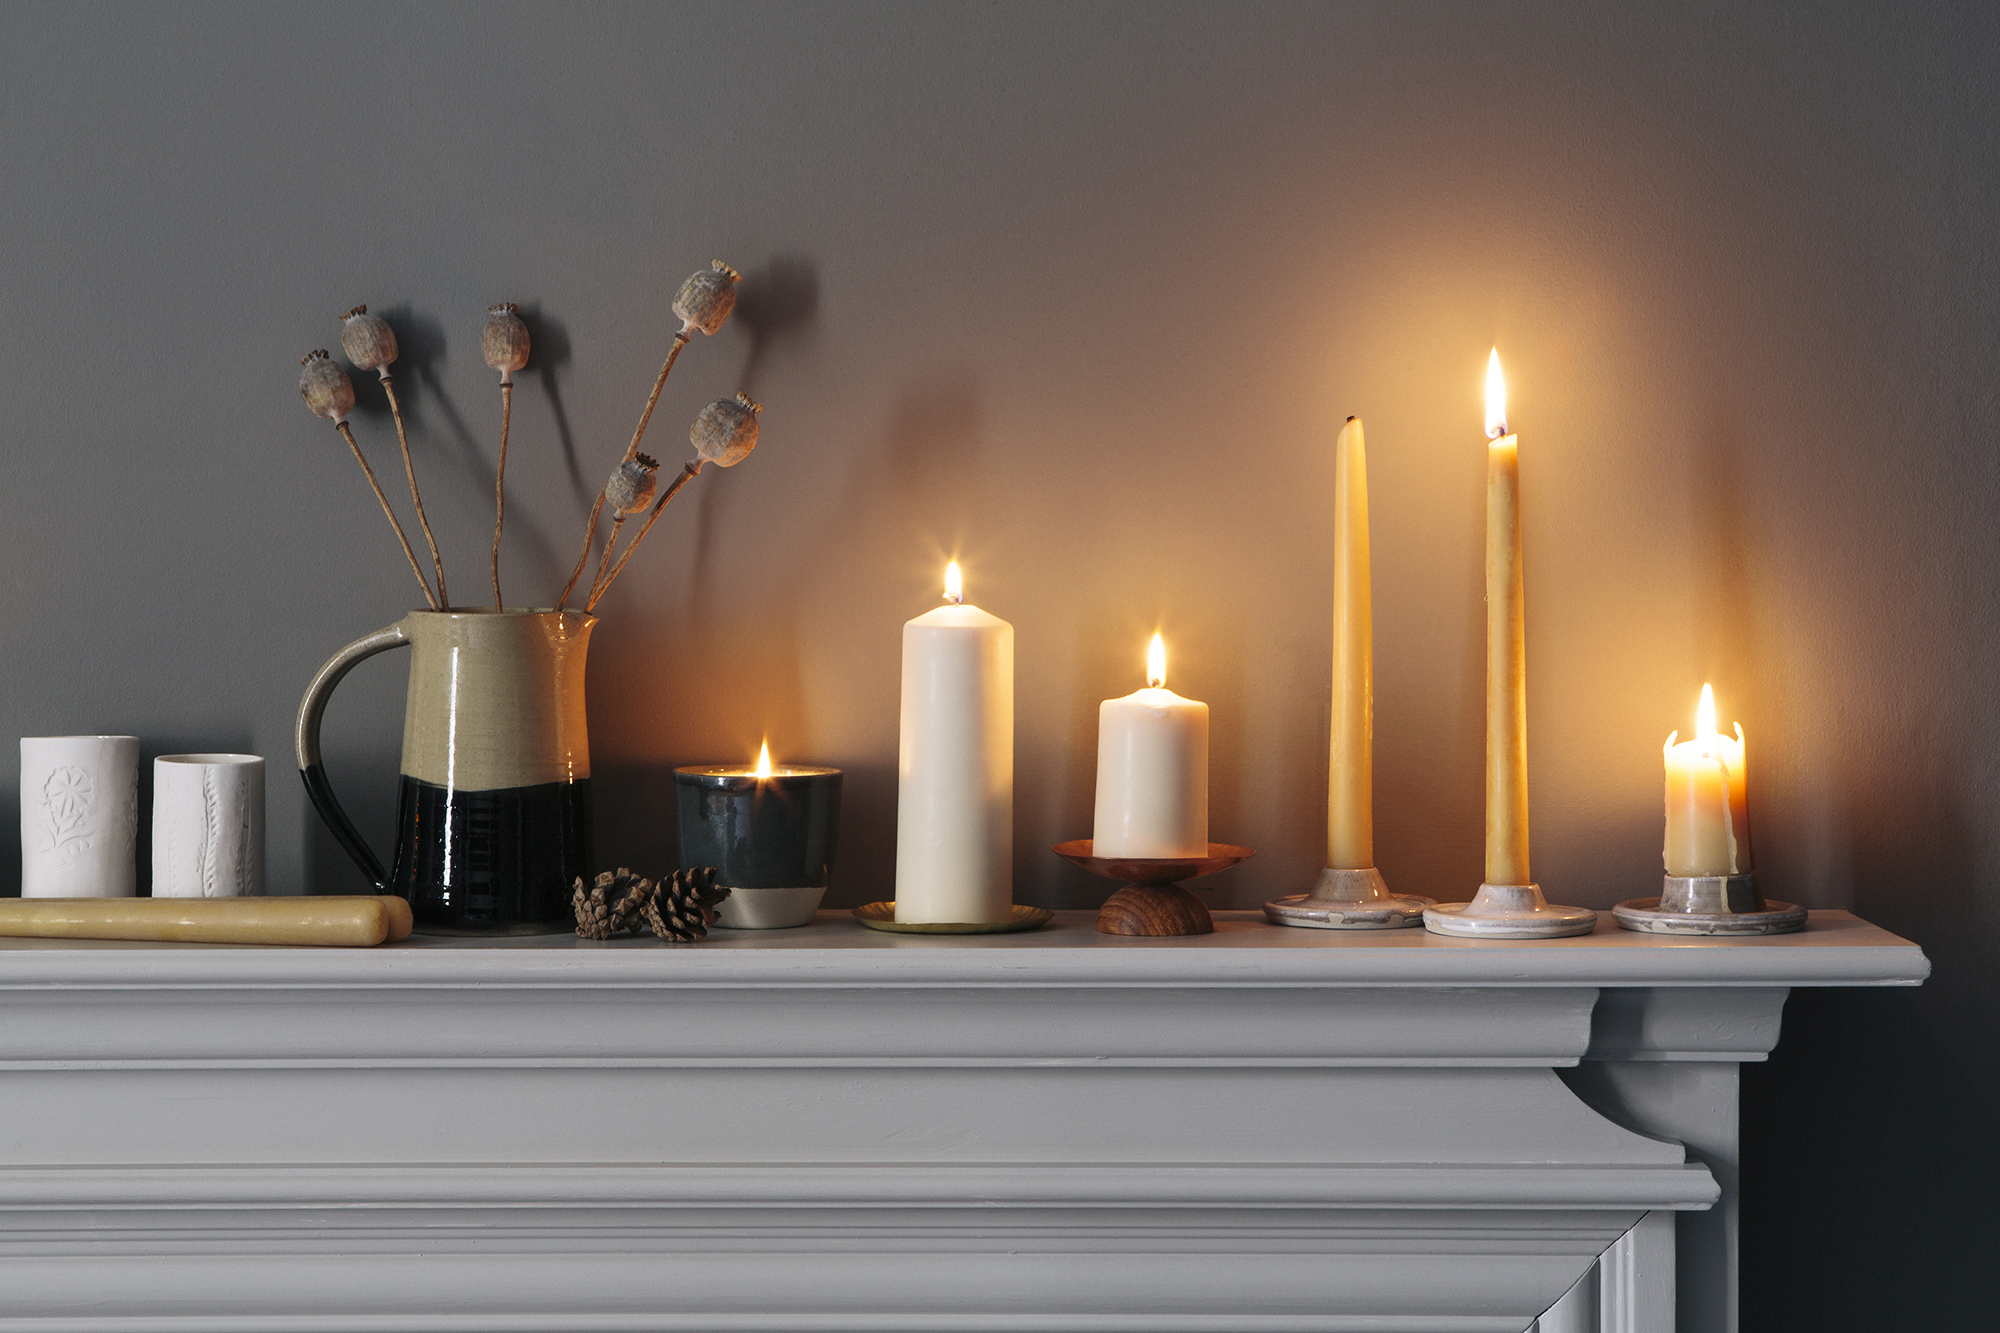 Aerende candle glow credit www.annaandtam.com.jpg